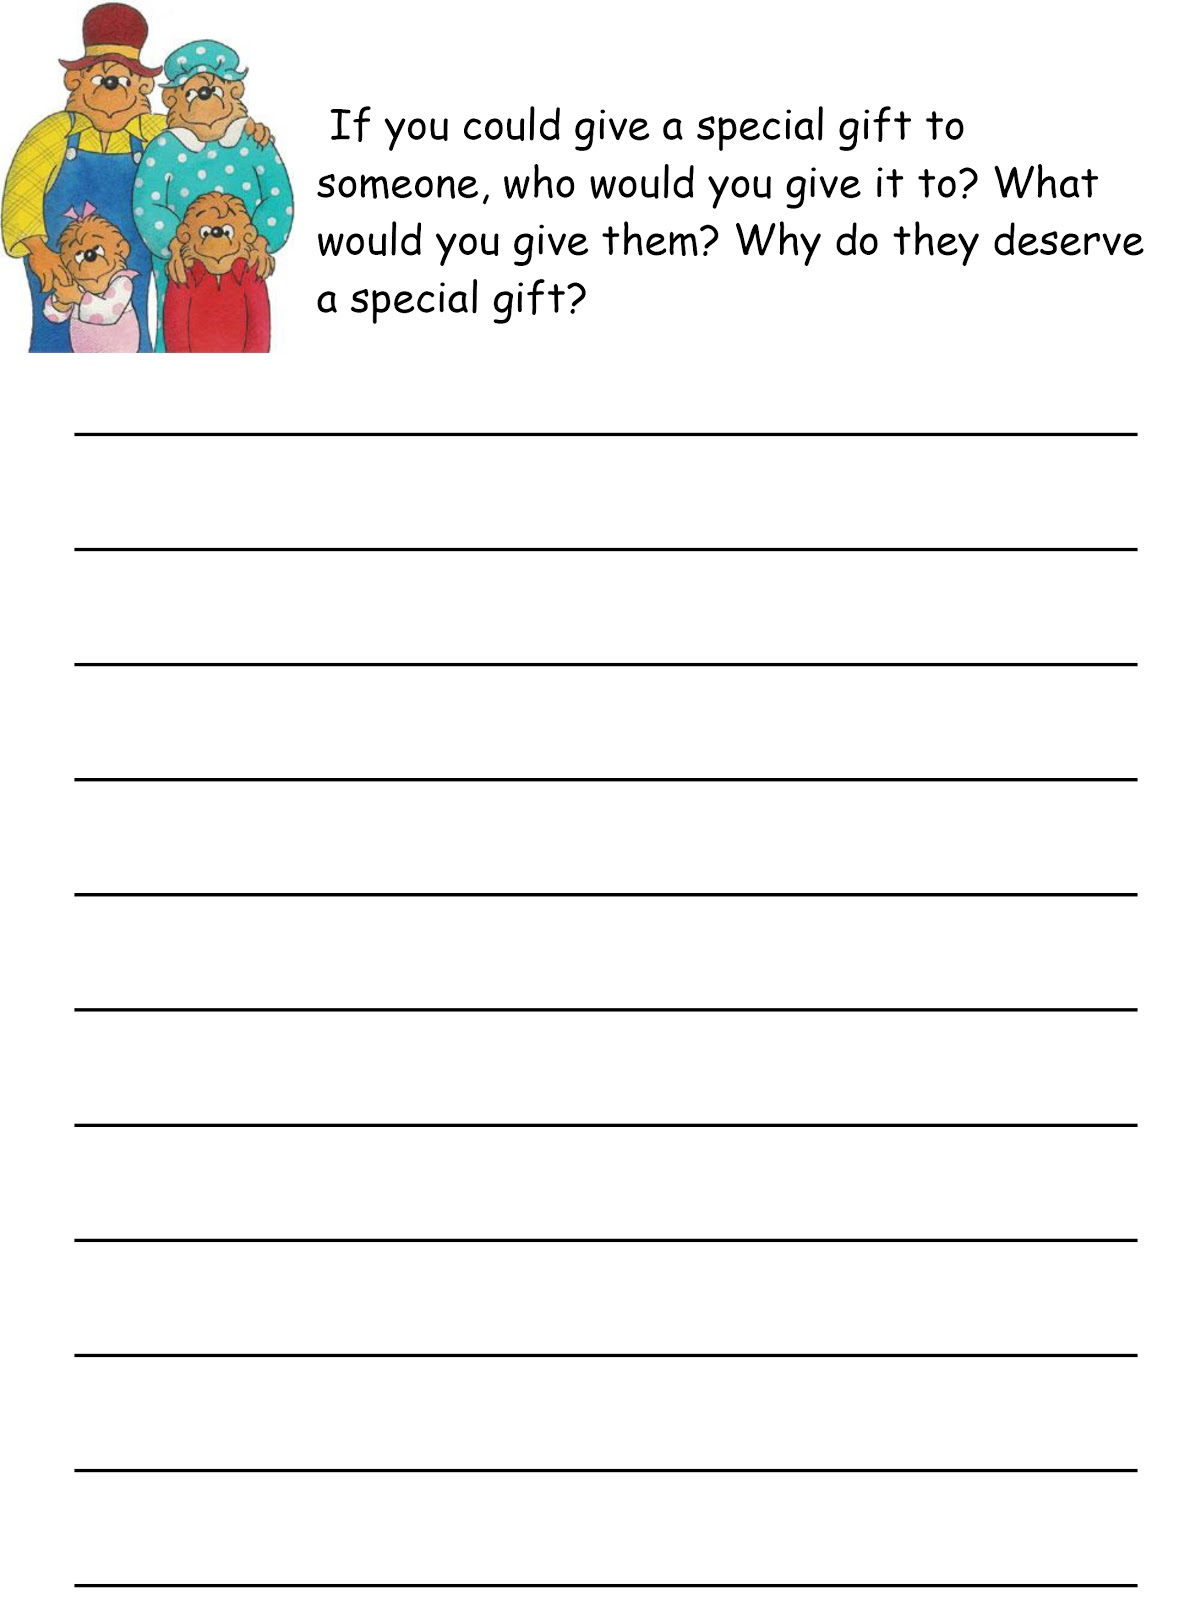 Creative Writing Myself Grade 1 - — Help on writing an essay about myself [ 1600 x 1201 Pixel ]